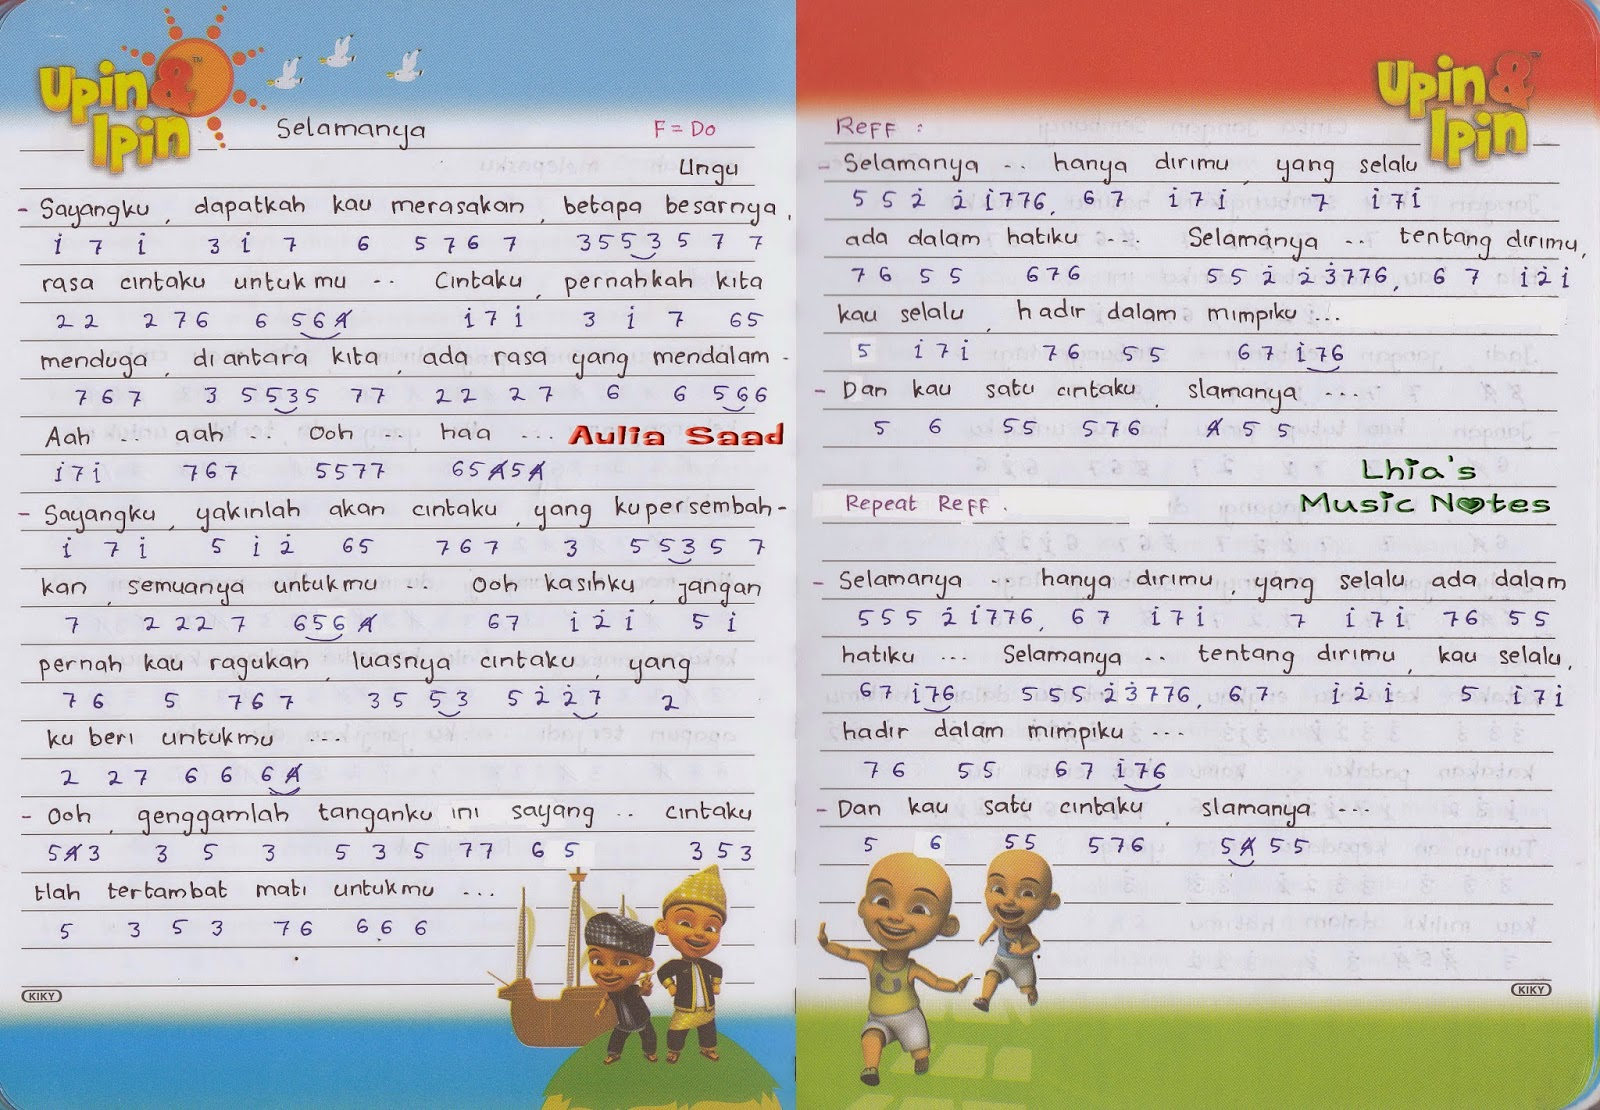 not lagu u2013 Ungu : Lhiau0026#39;s Music Notes